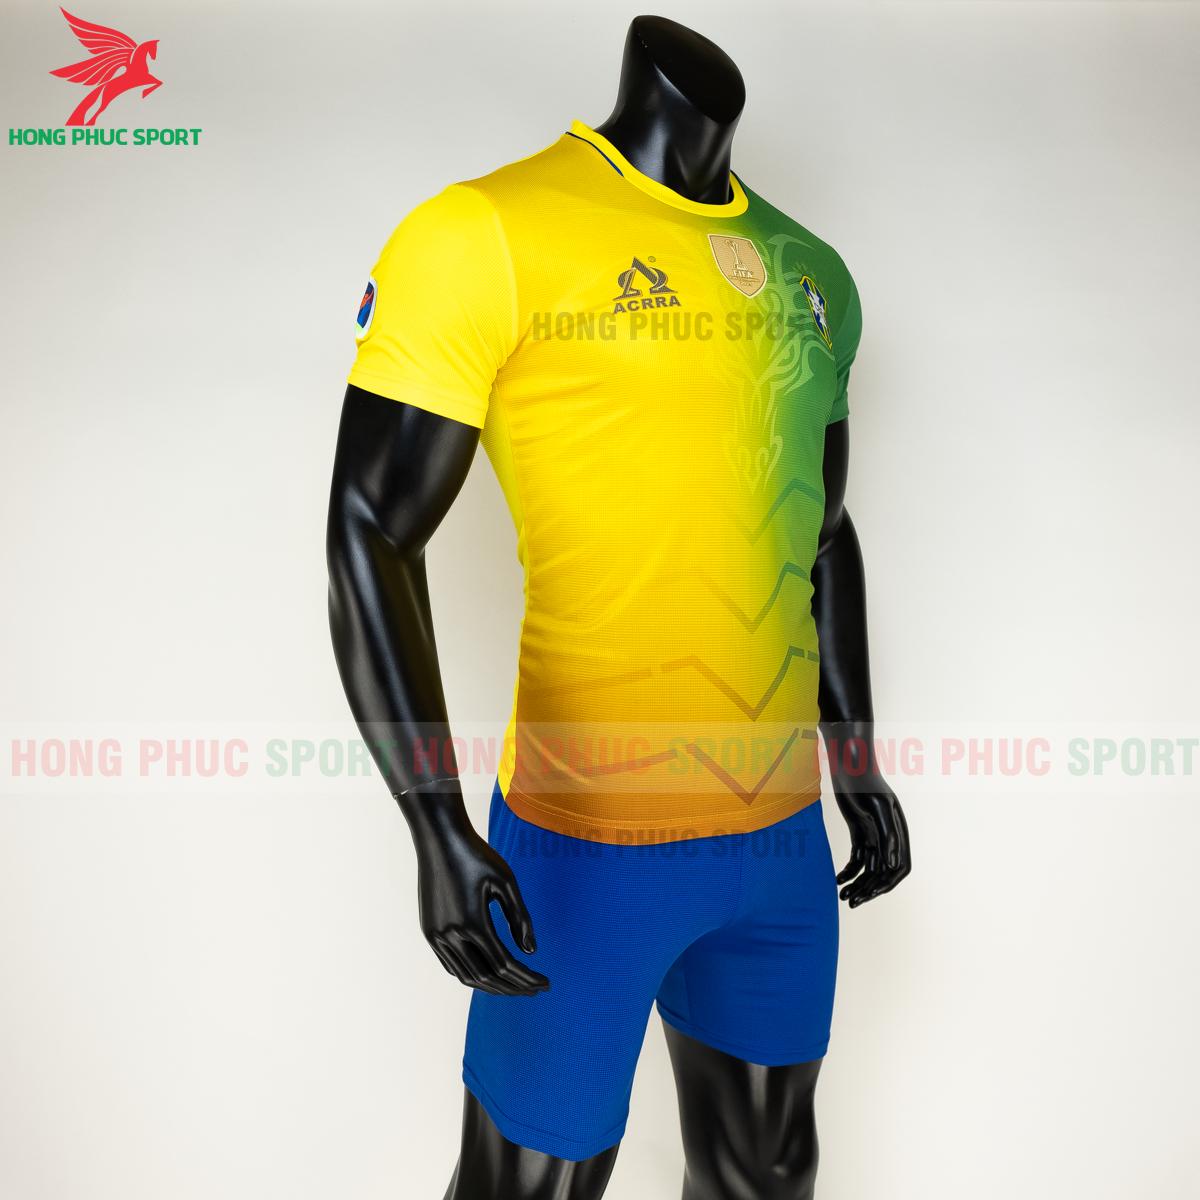 https://cdn.hongphucsport.com/unsafe/s4.shopbay.vn/files/285/ao-tuyen-brazil-hang-det-phien-ban-fan-acrra-4-5fa0fd81cc639.png